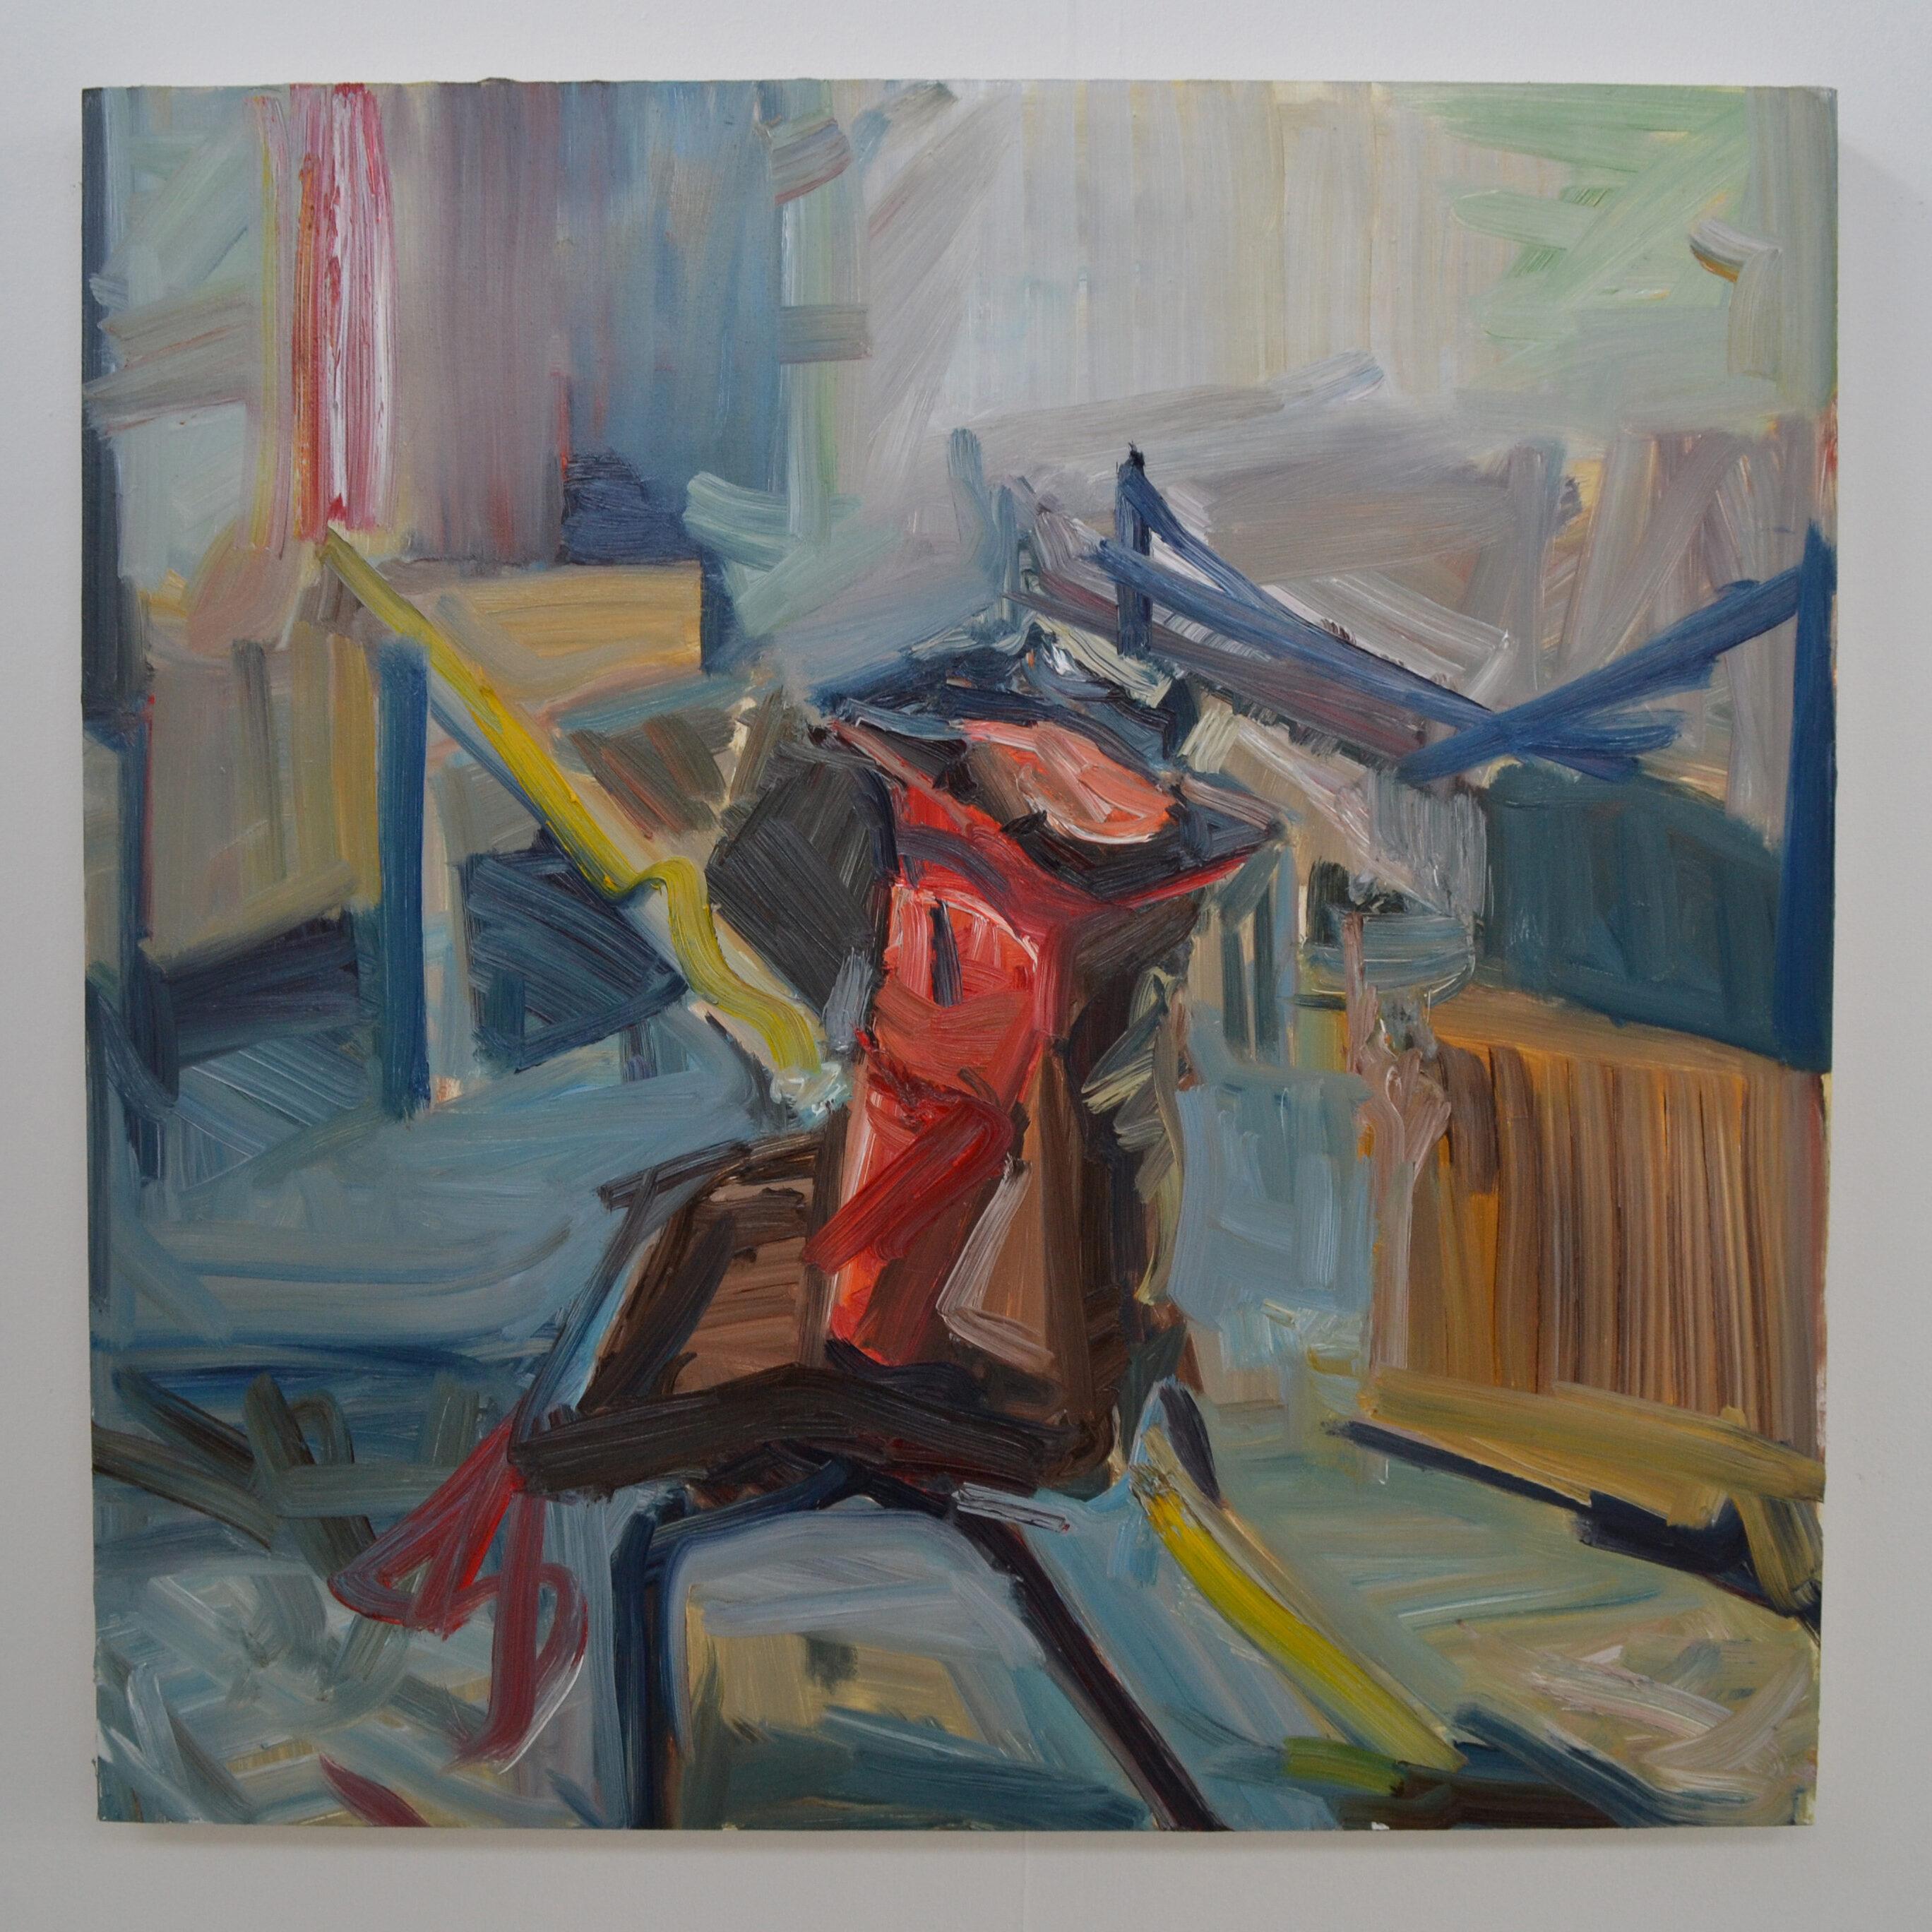 Chair, 2015, 140 x 140 cm, oil on canvas.